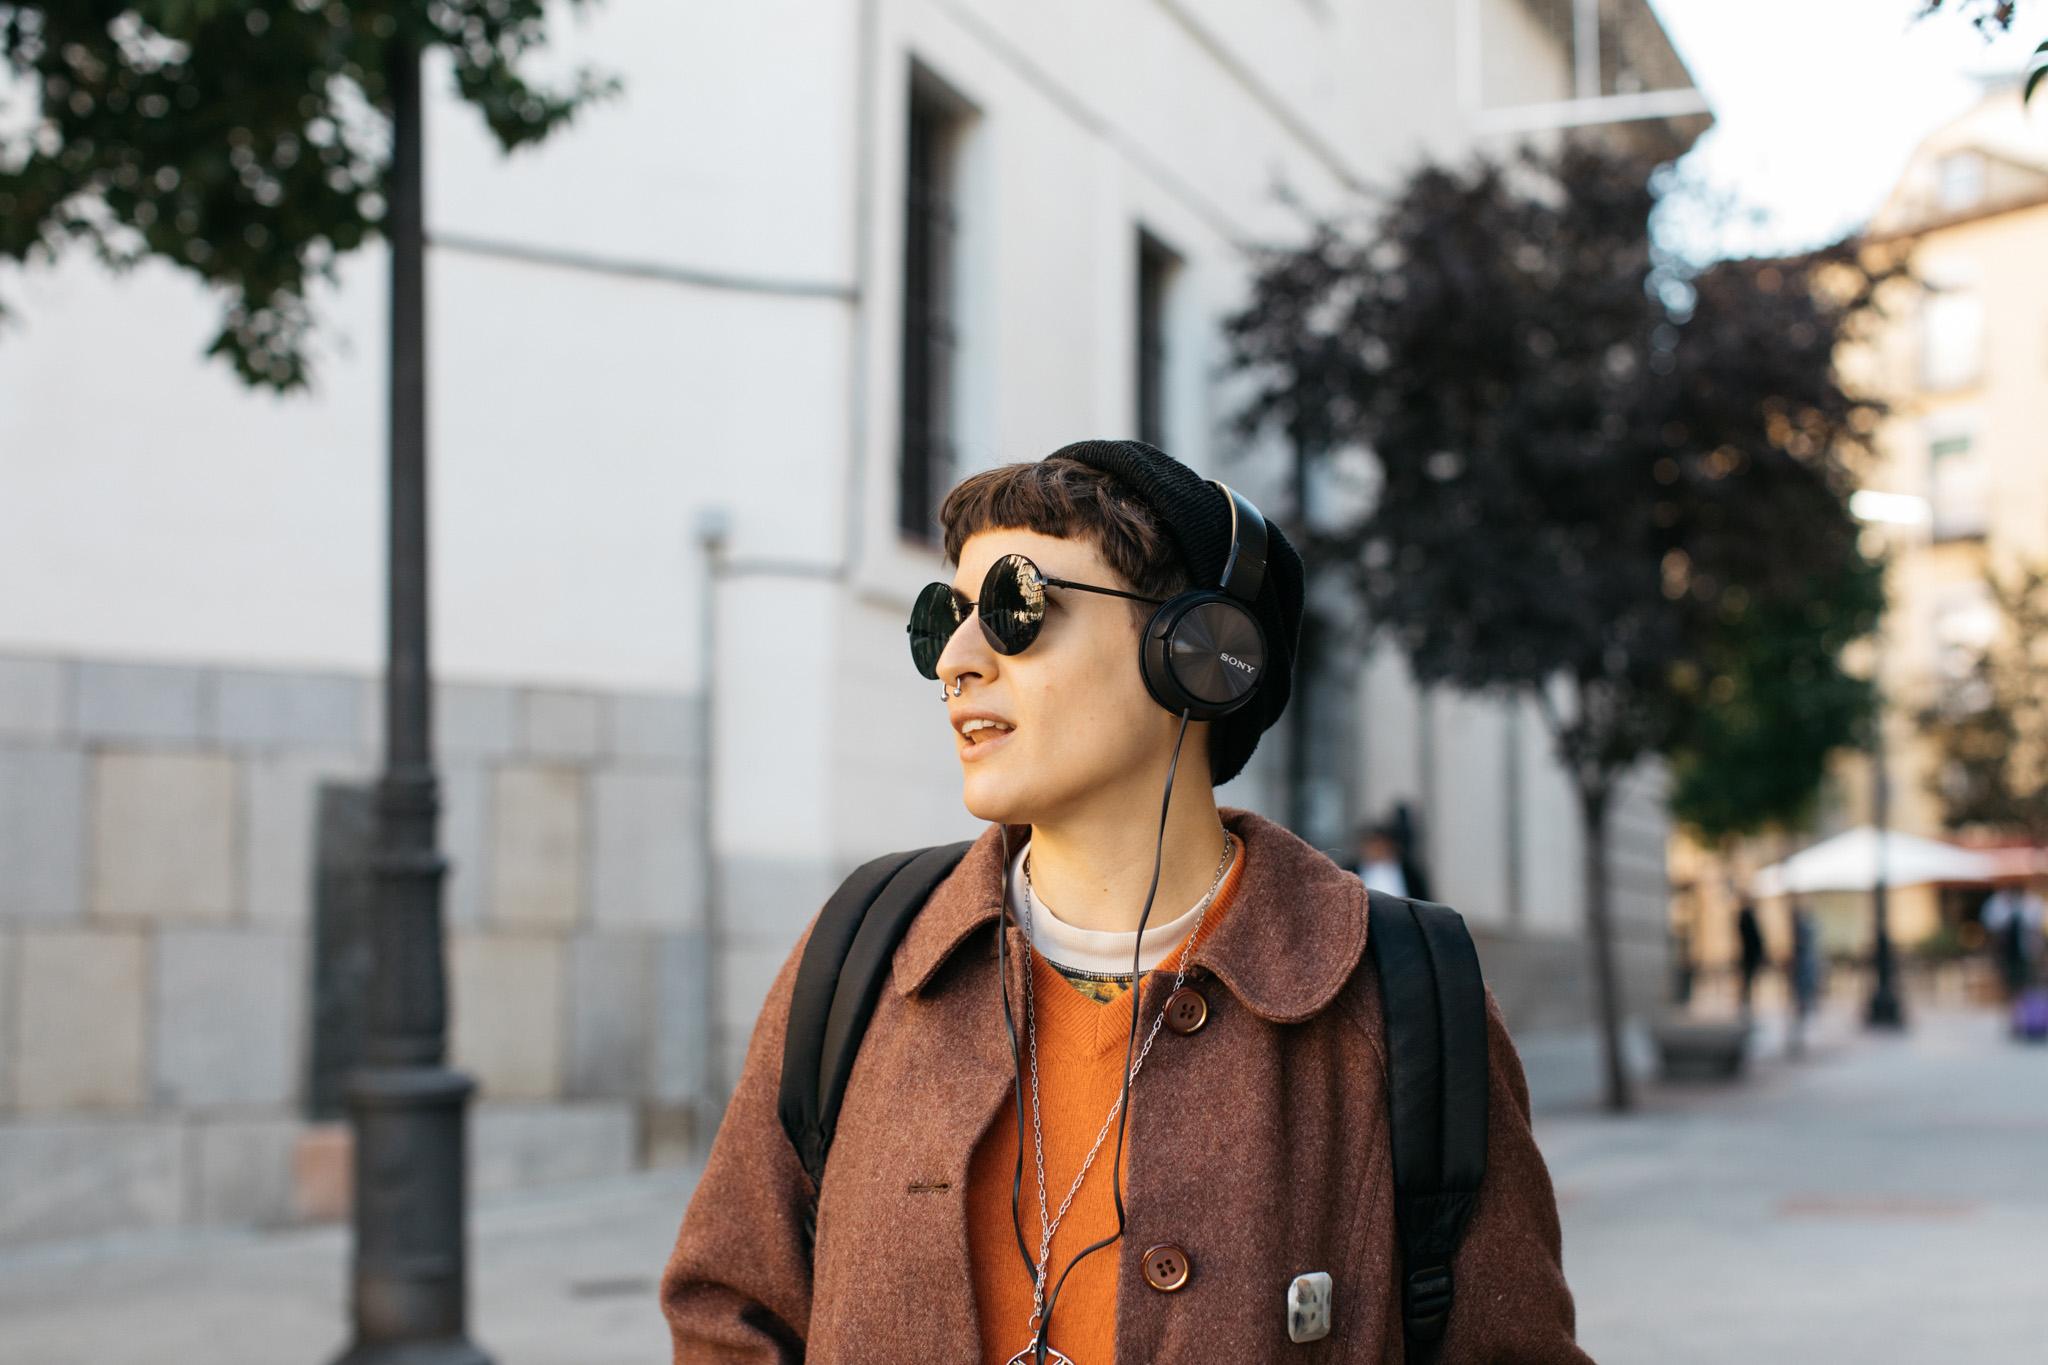 Deezer + street portraits   A European campaign for Deezer meeting strangers in the street